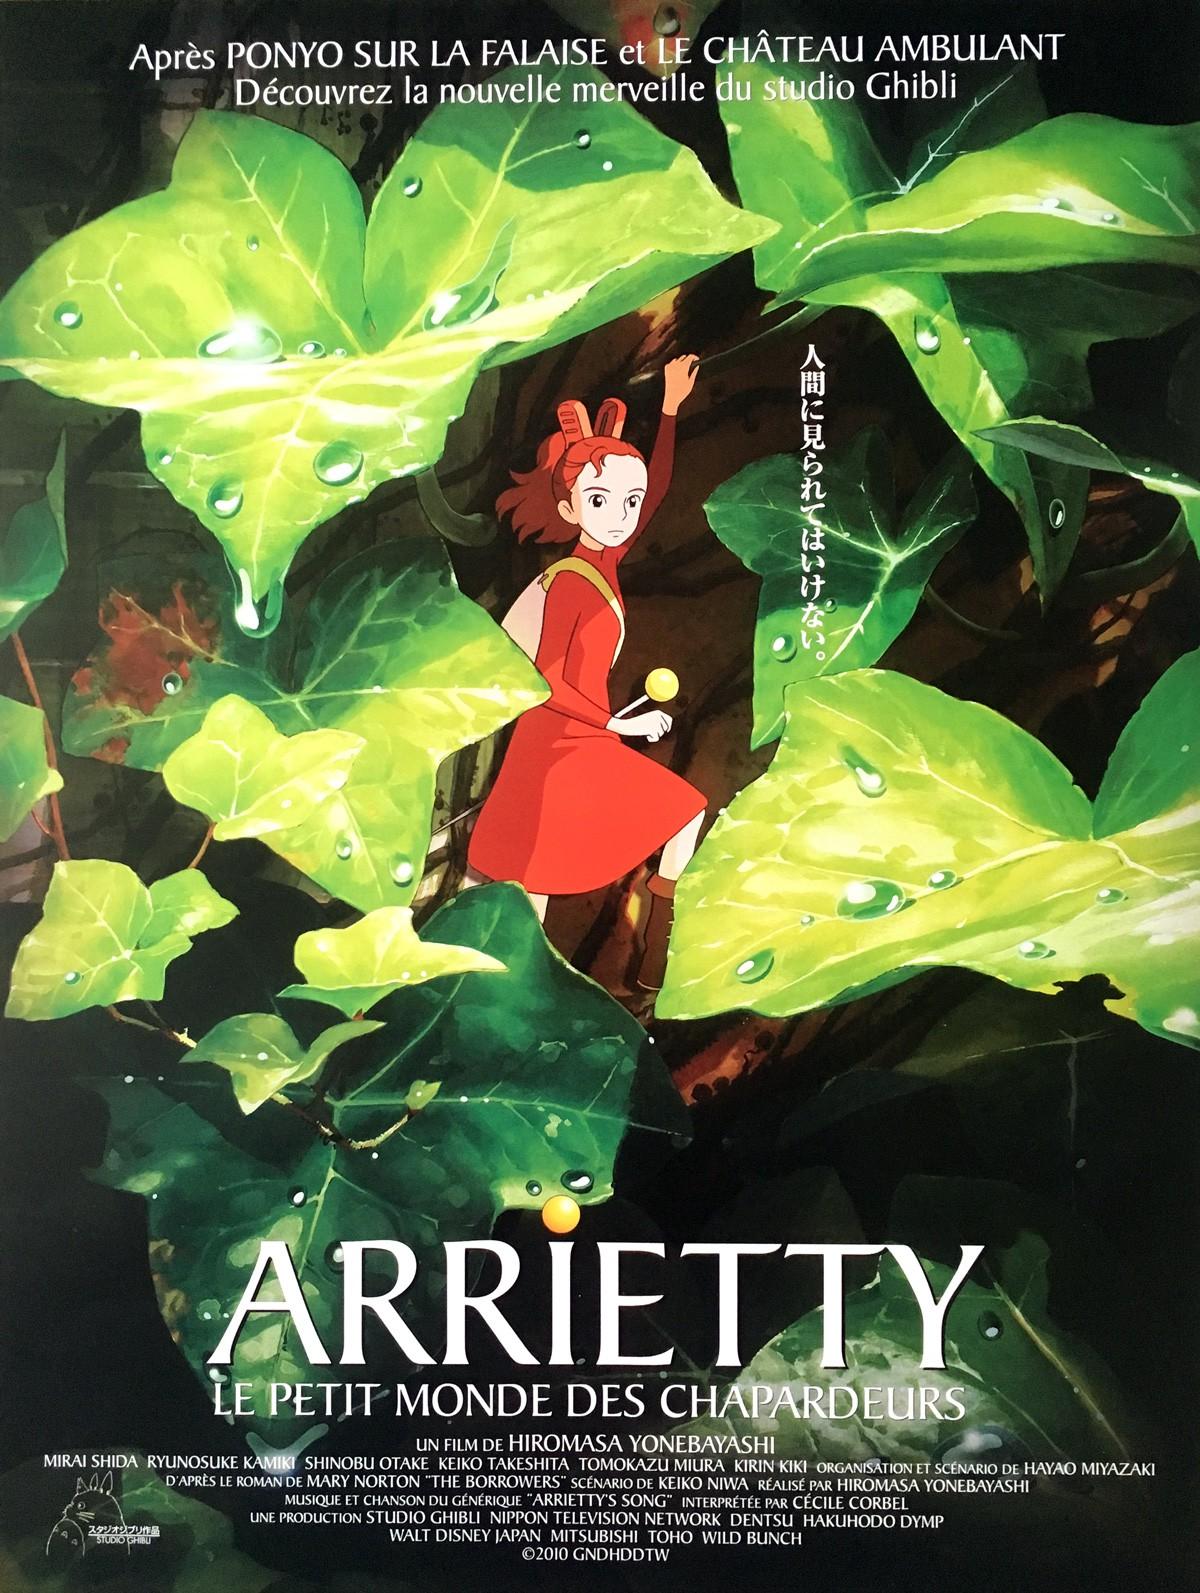 the-secret-world-of-arrietty-movie-poster-15×21-in-2010-studio-ghibli-hayao-miyazaki